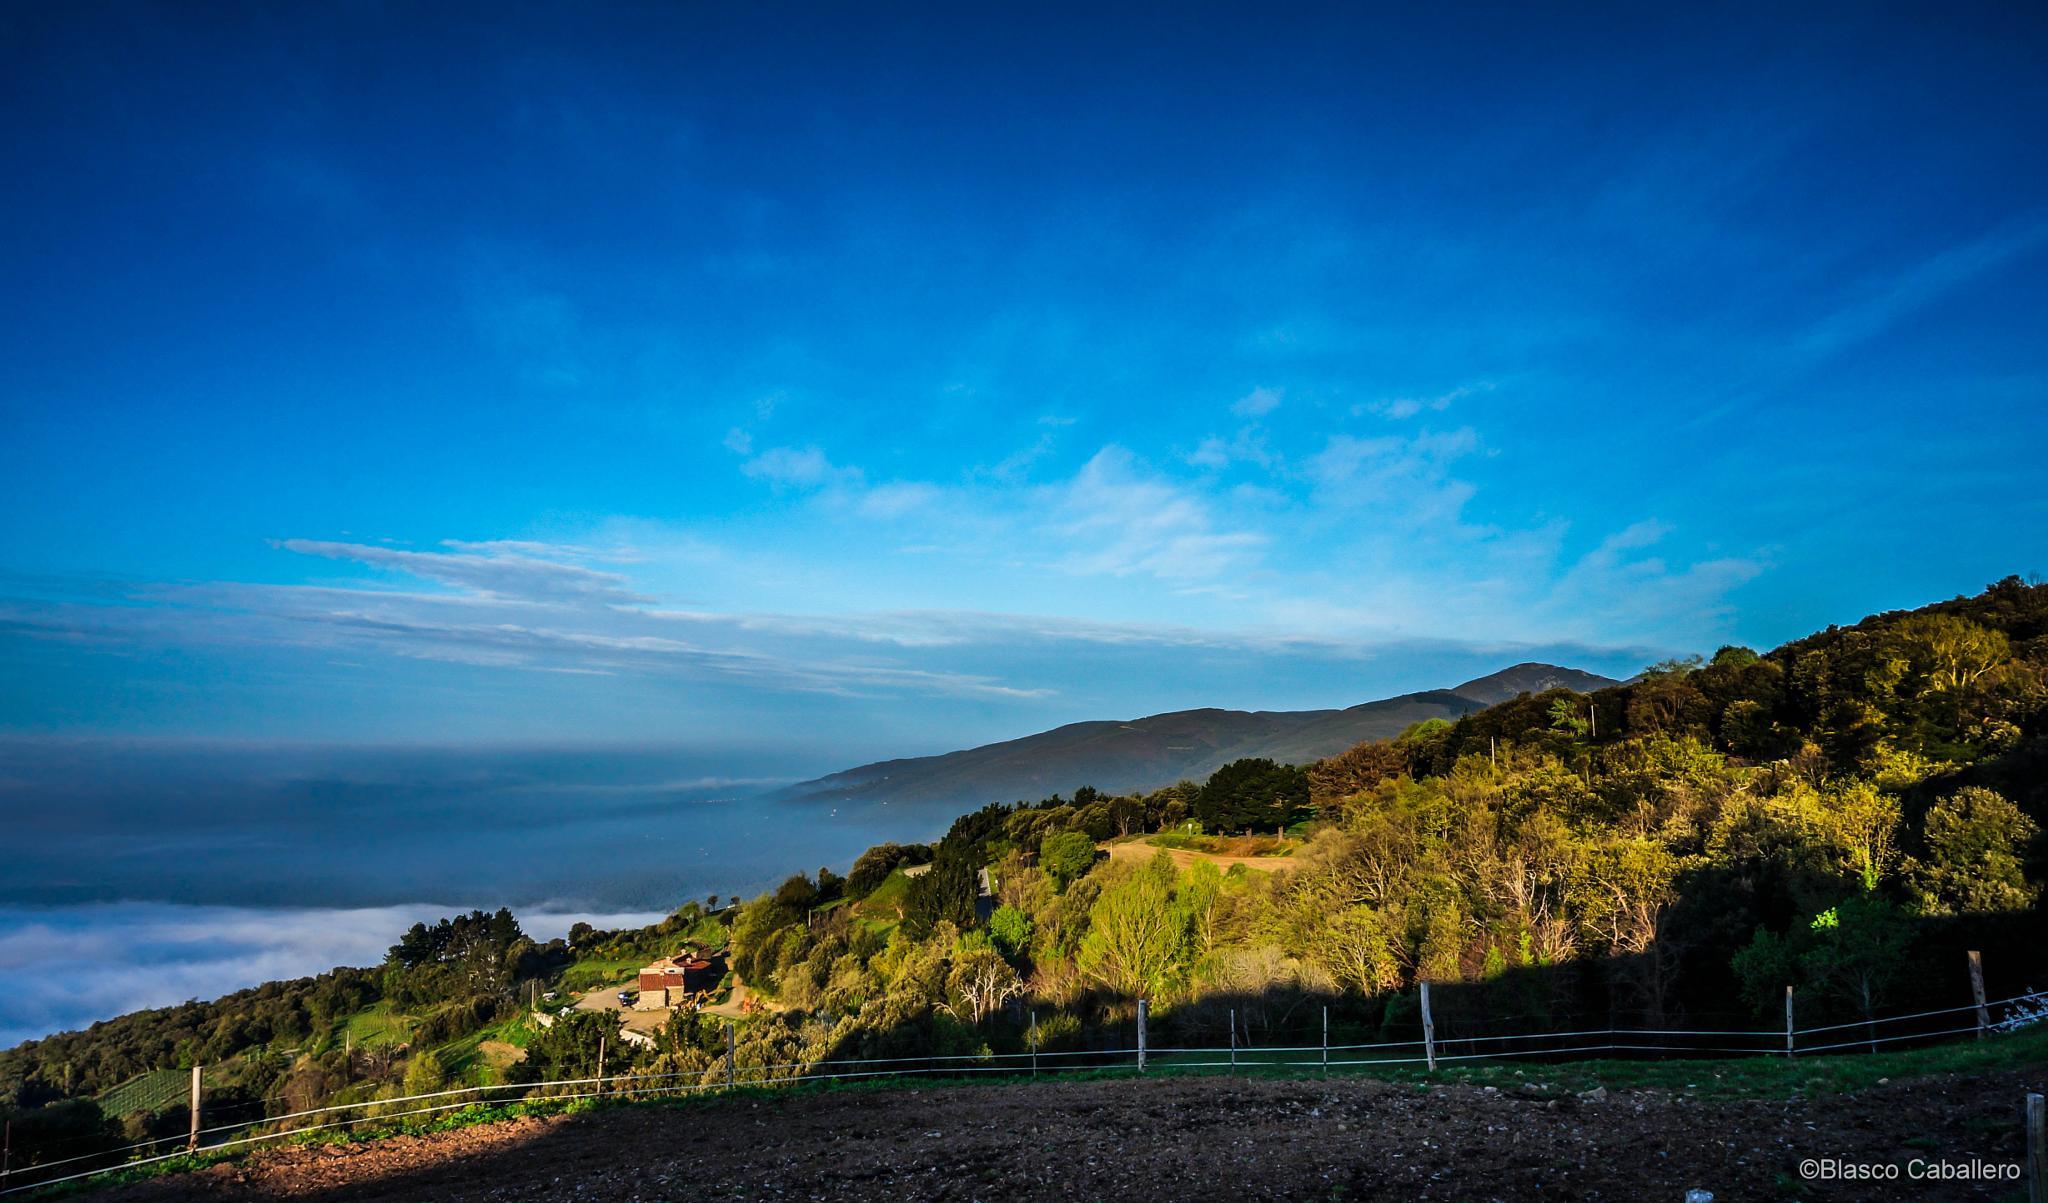 Montseny Landscape by Blasco Caballero